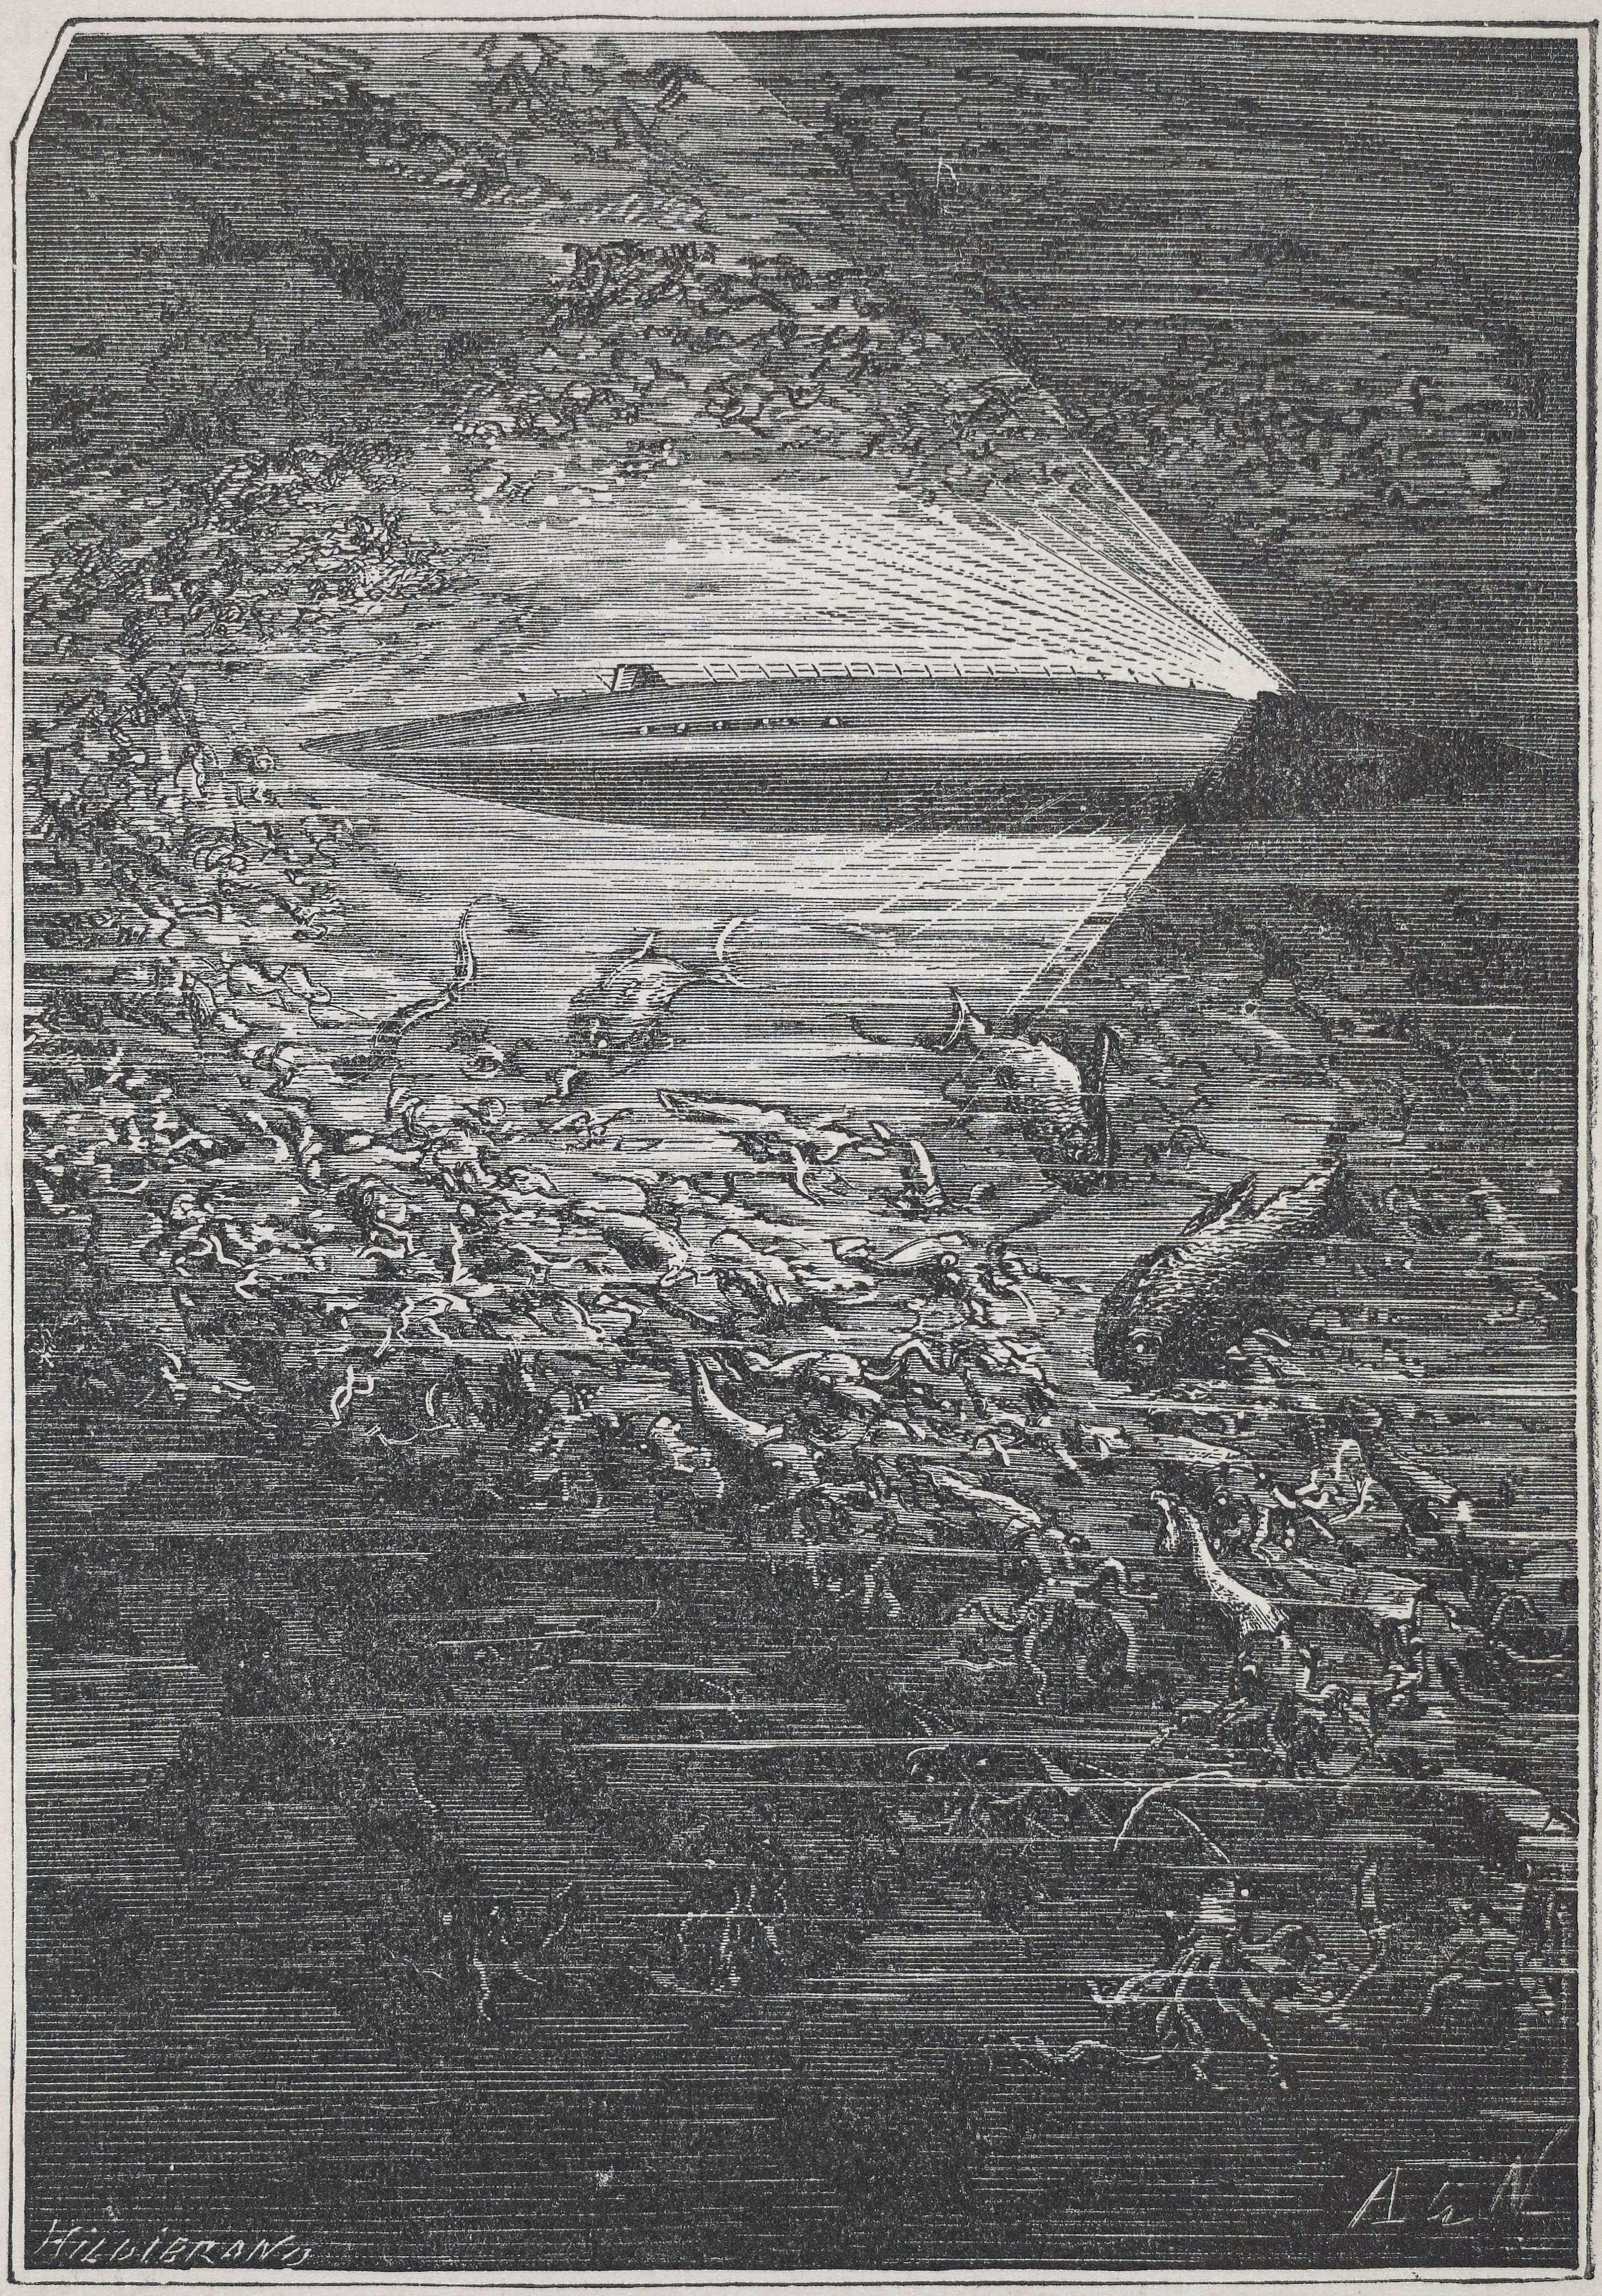 Nautilus Verne Wikipedia